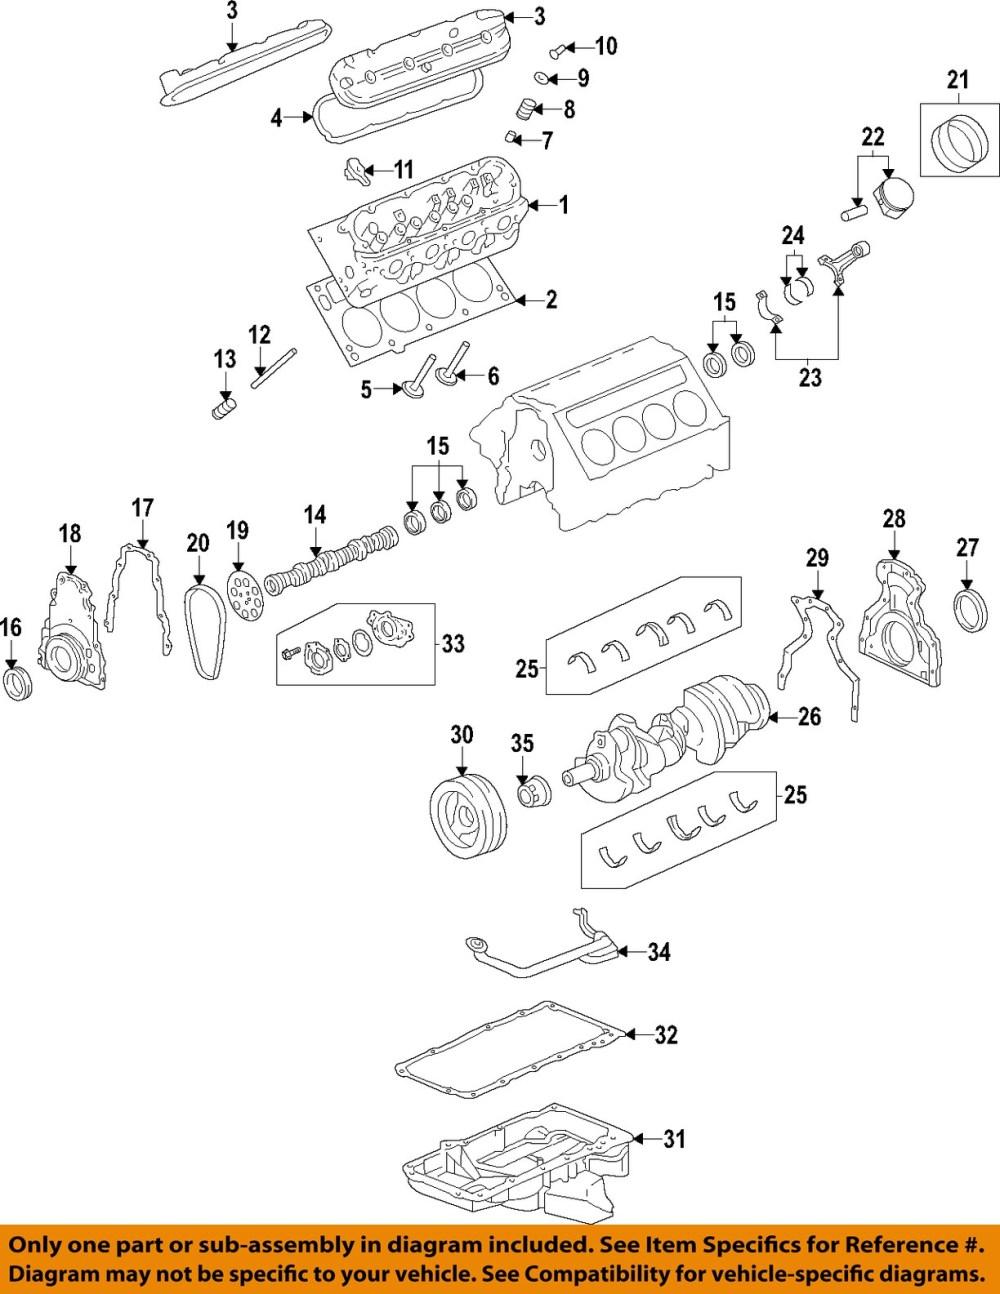 medium resolution of gm oem engine intake valve 12563063 ebay gm power steering diagram 5 on diagram only genuine